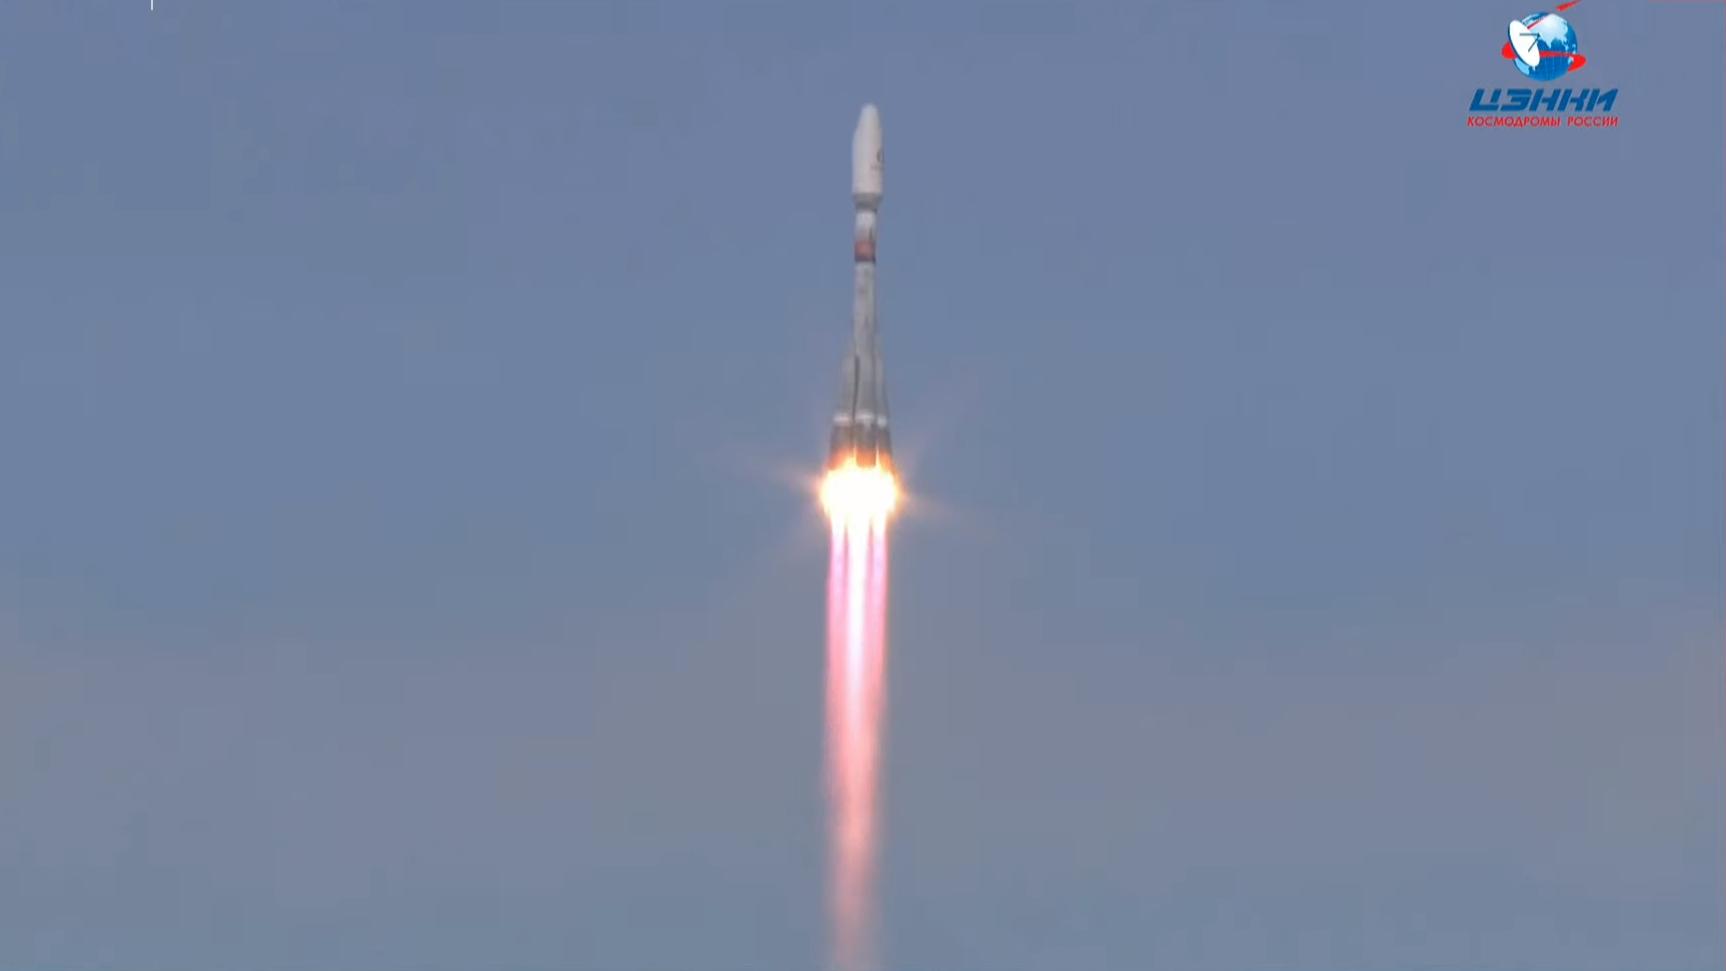 Une fusée Arianespace Soyouz lance 36 satellites OneWeb en orbite le 24 mars 2021.